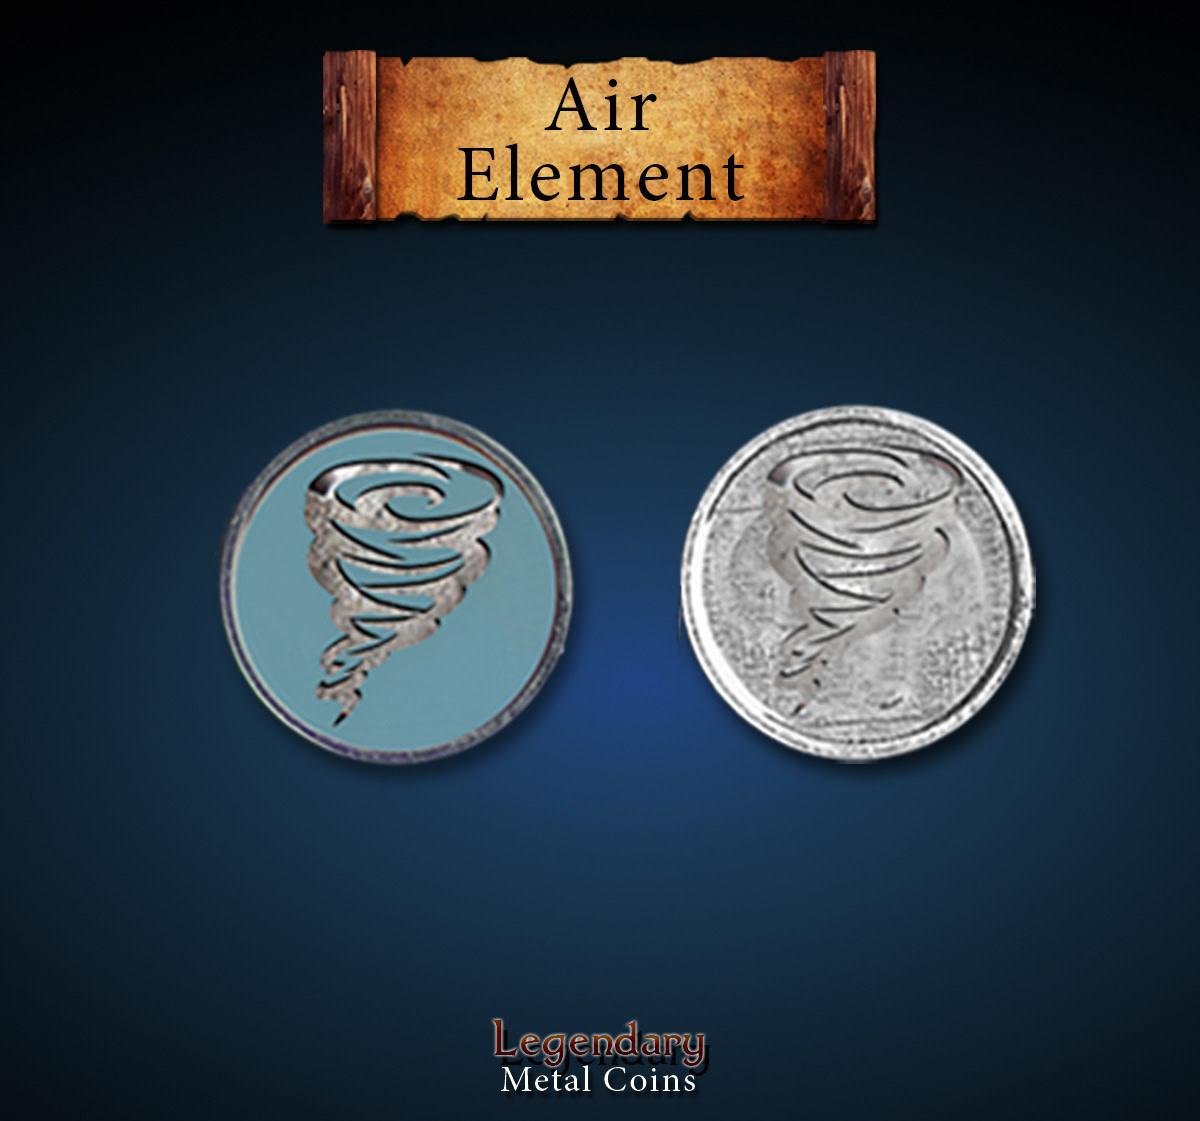 Legendary Metal Coins:  Air Element (12pcs)